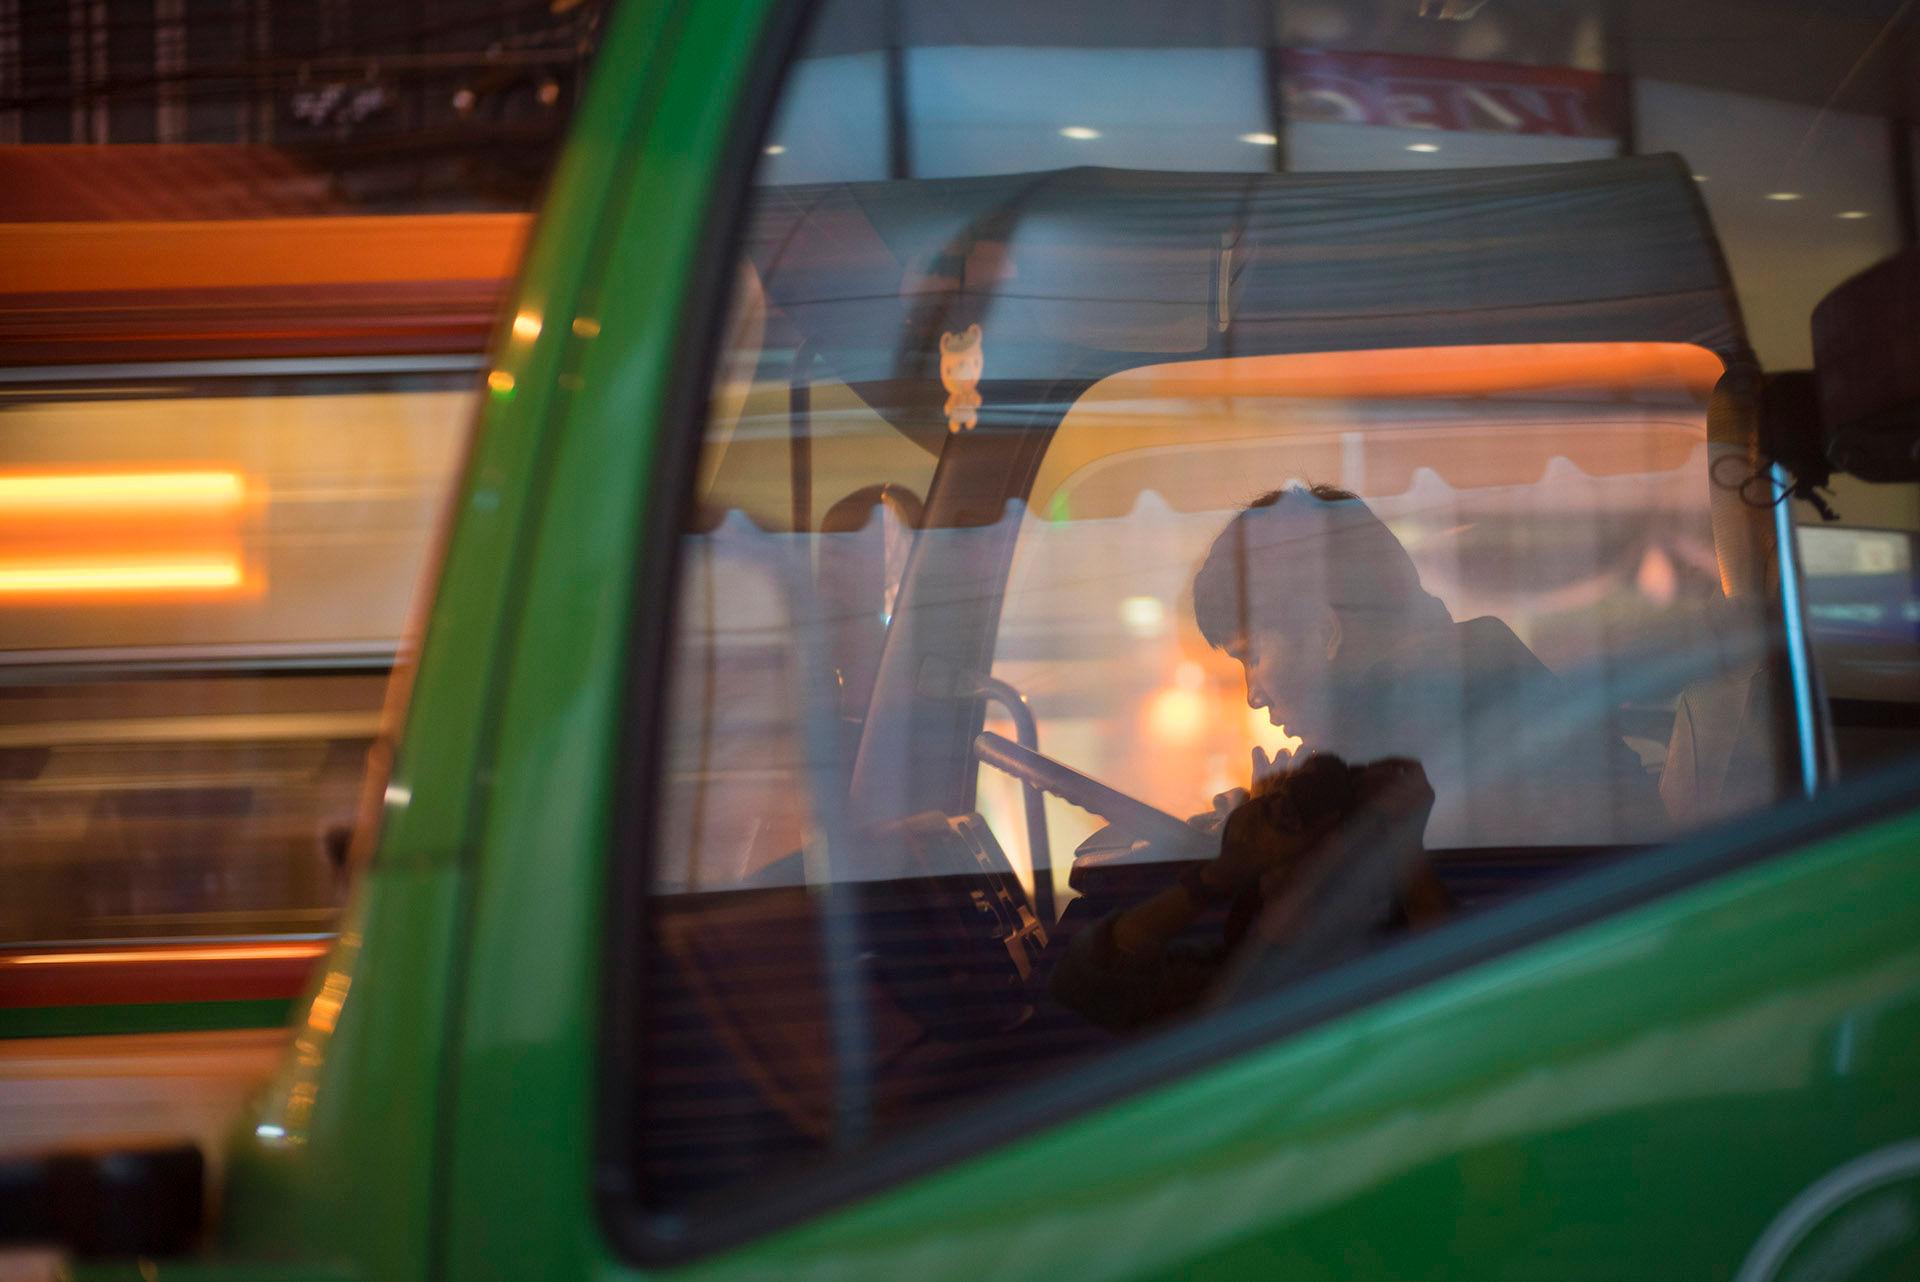 Man in Green Truck 50